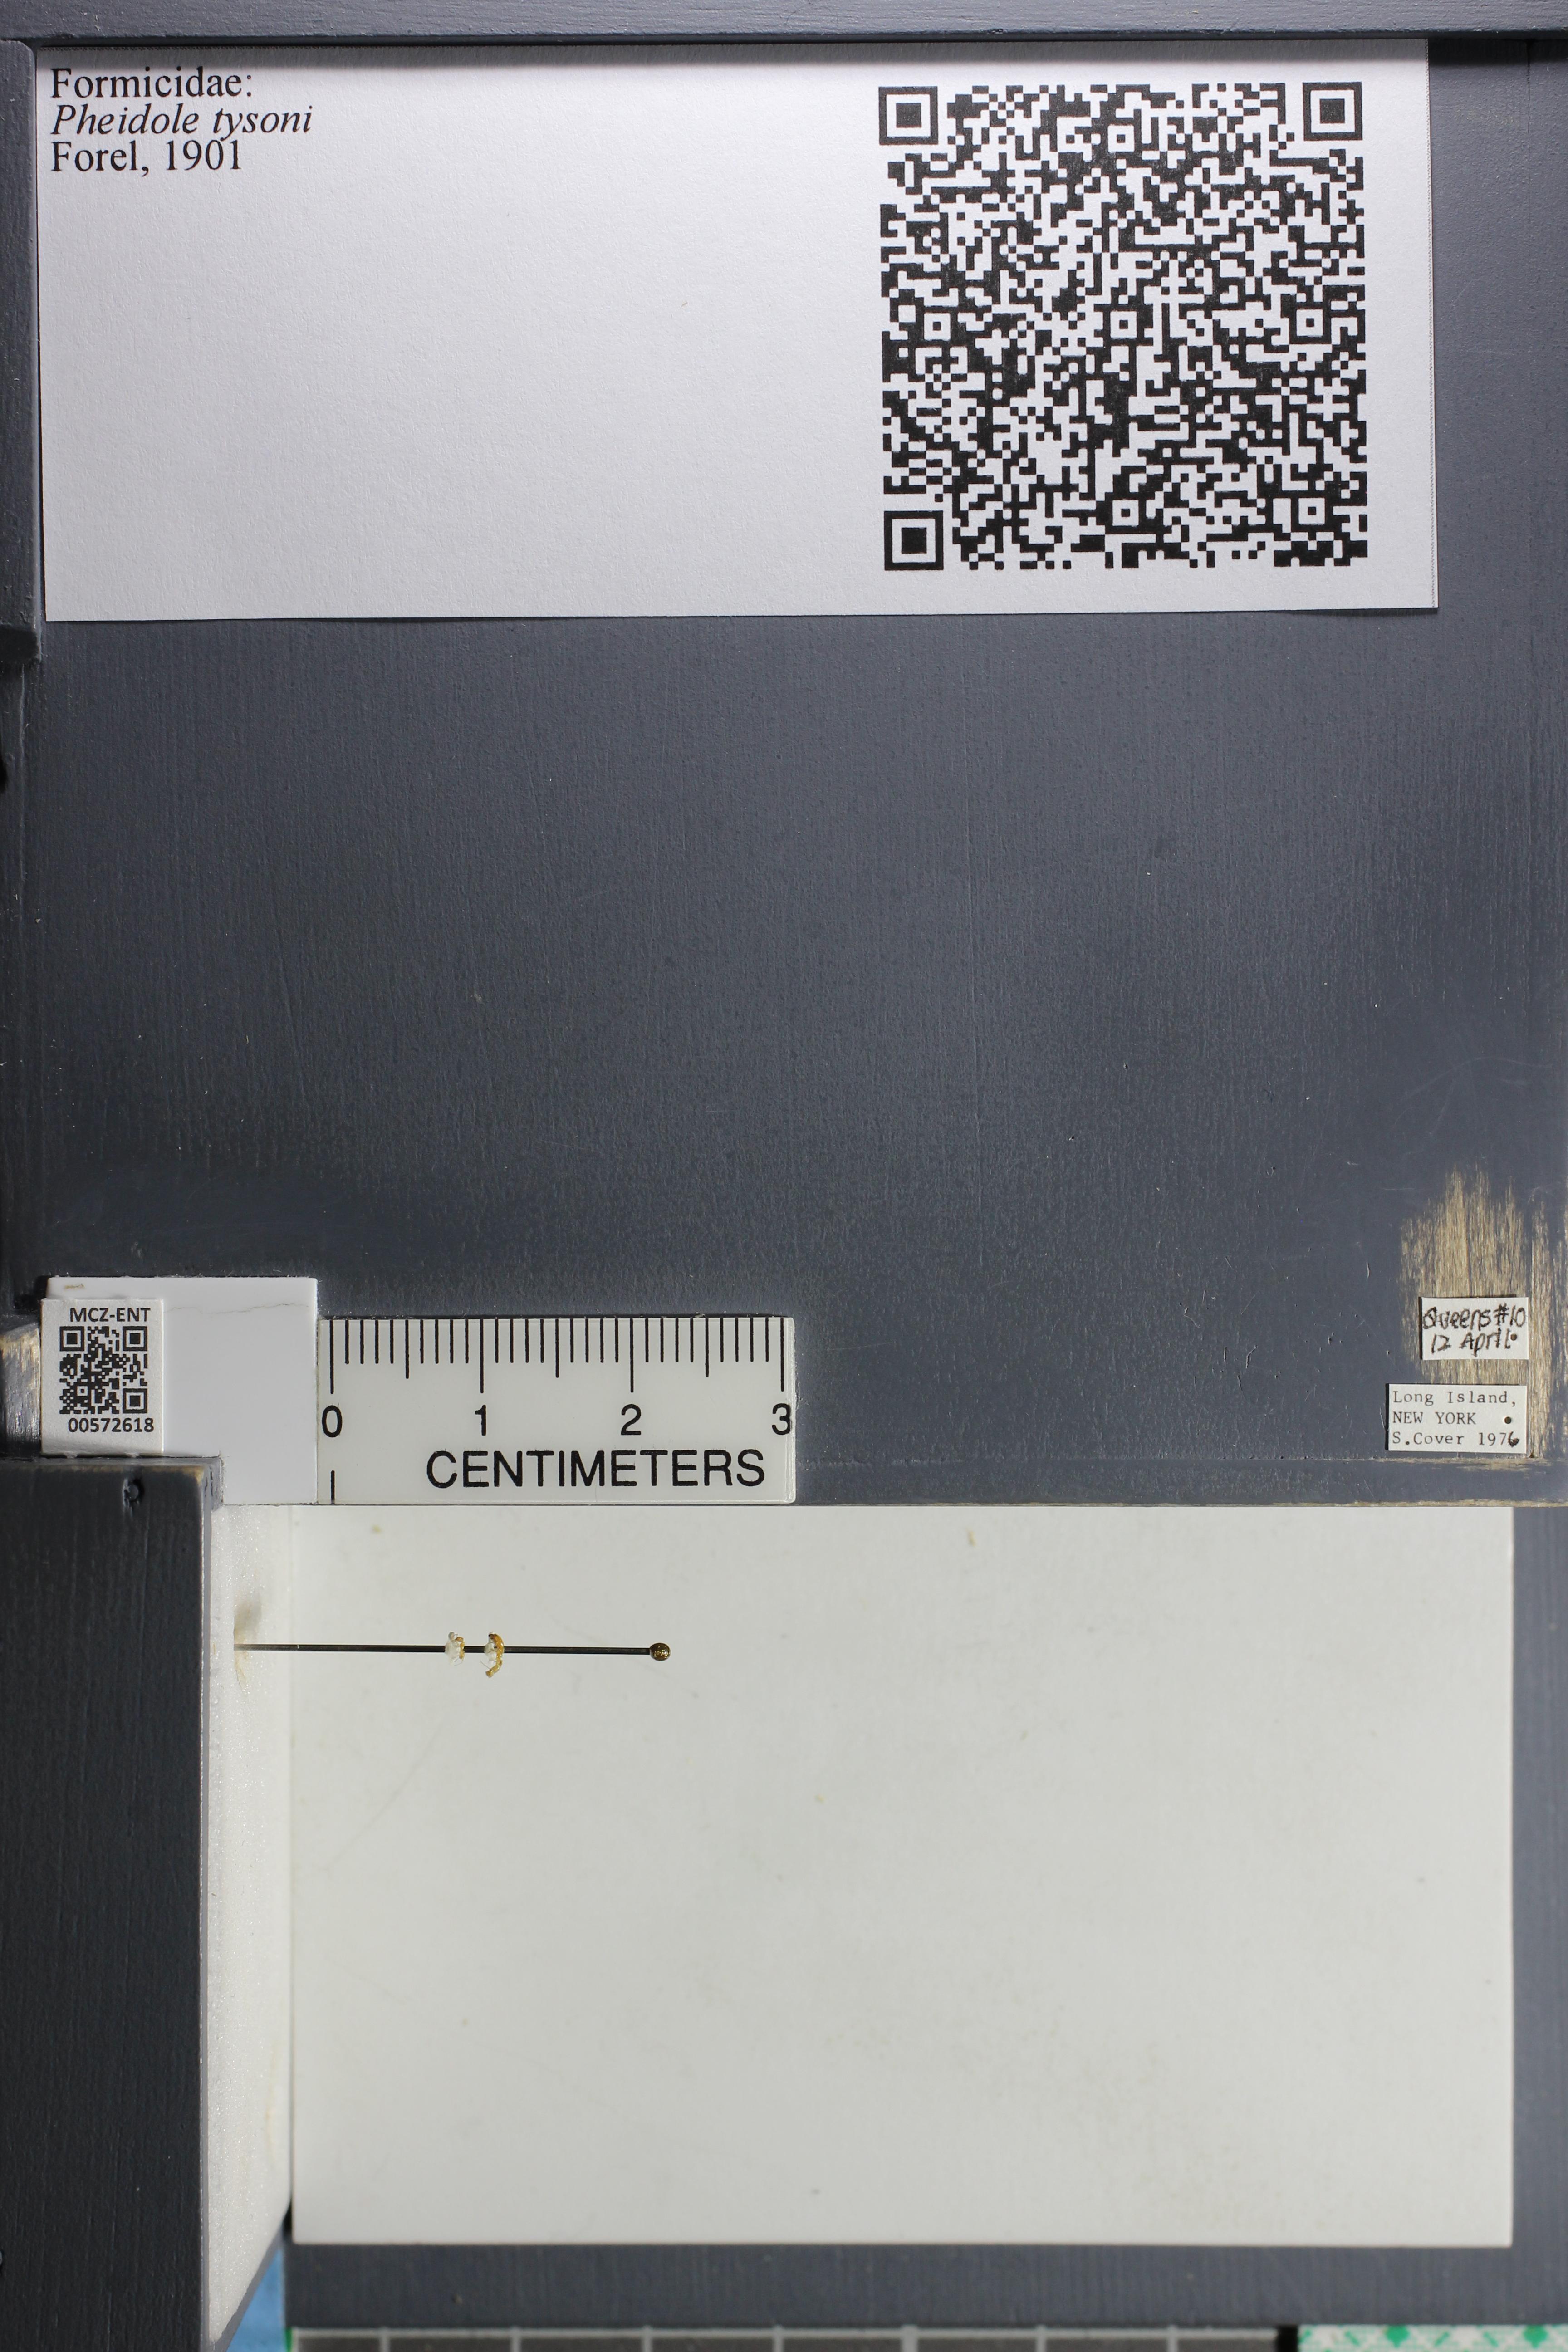 Media of type image, MCZ:Ent:572618 Identified as Pheidole tysoni.